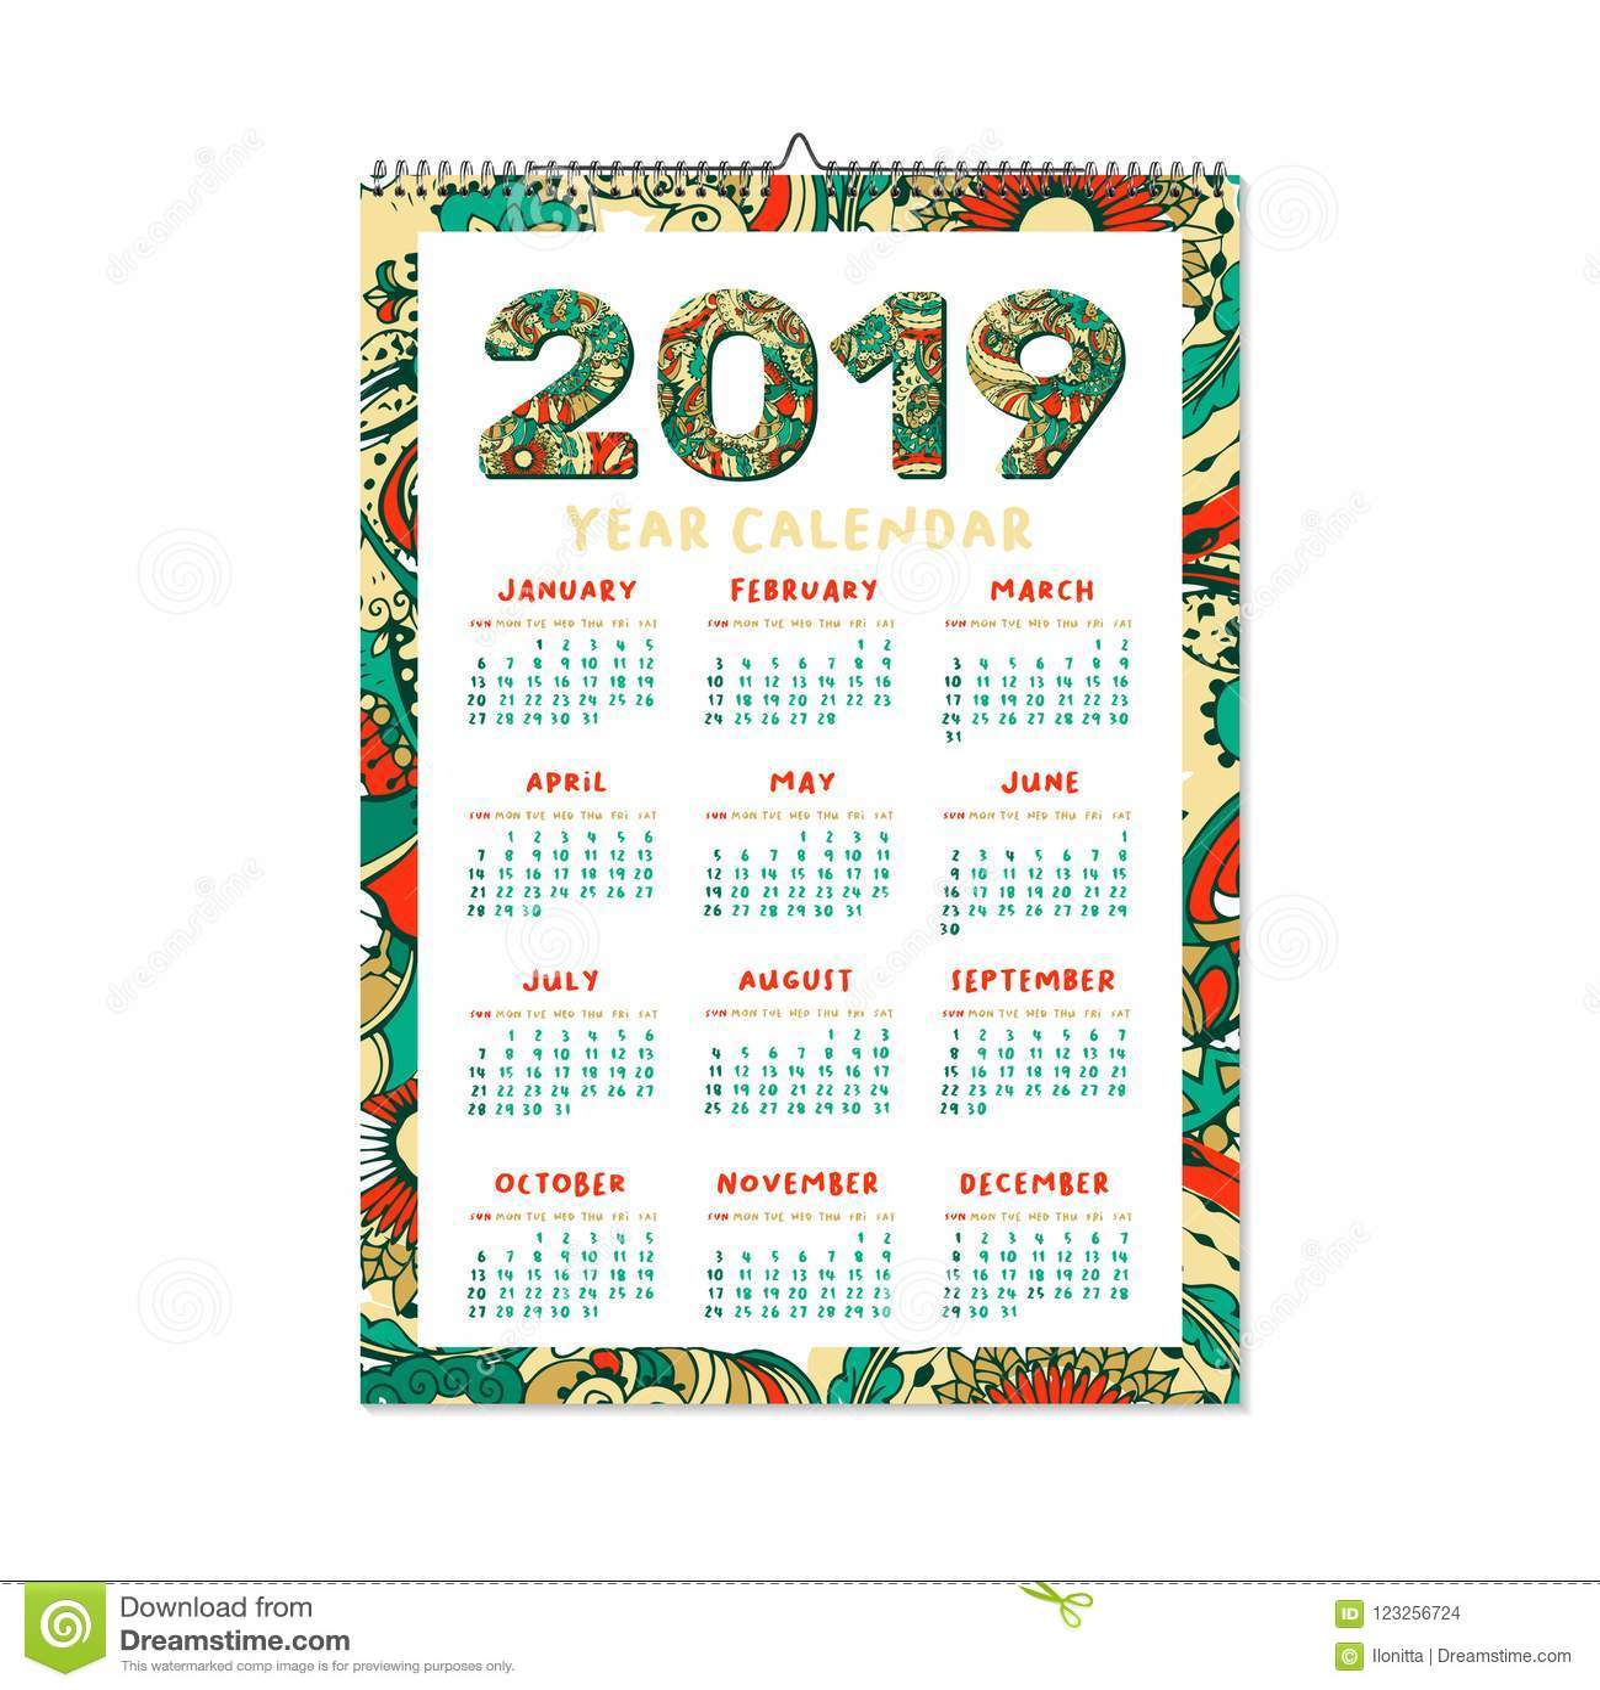 2019 year calendar xmas or happy new year holiday design